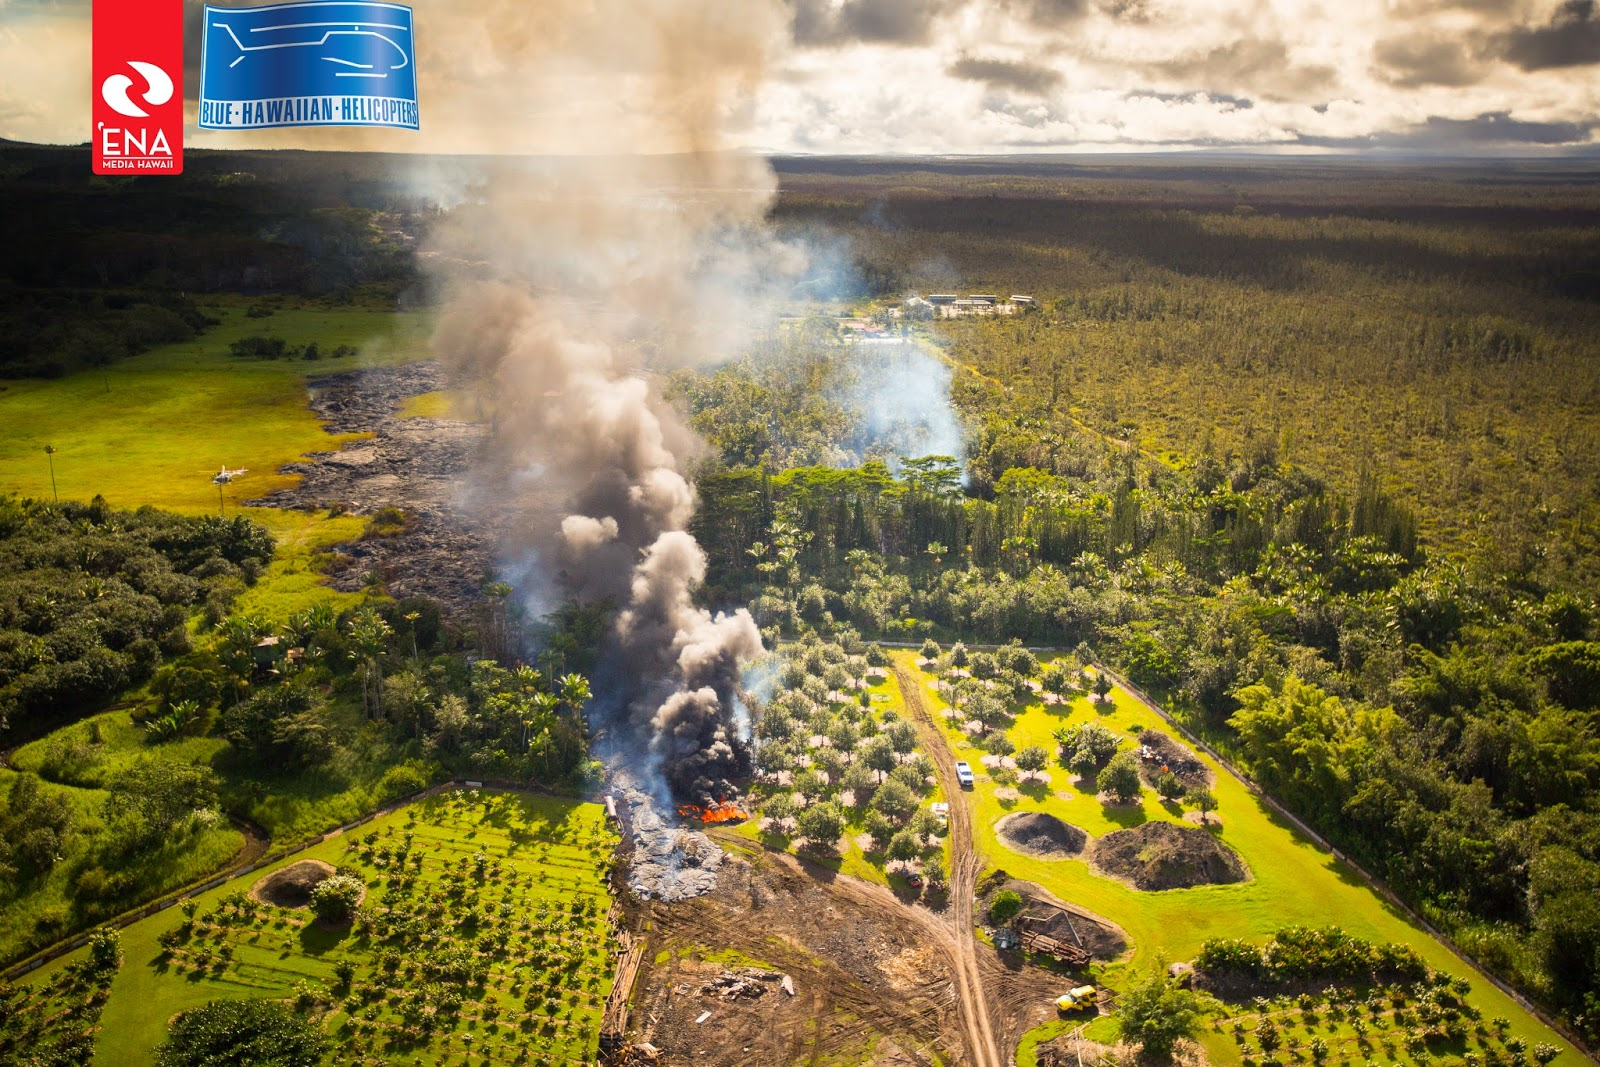 Courtesy Ena Media Hawaii & Blue Hawaiian Helicopters